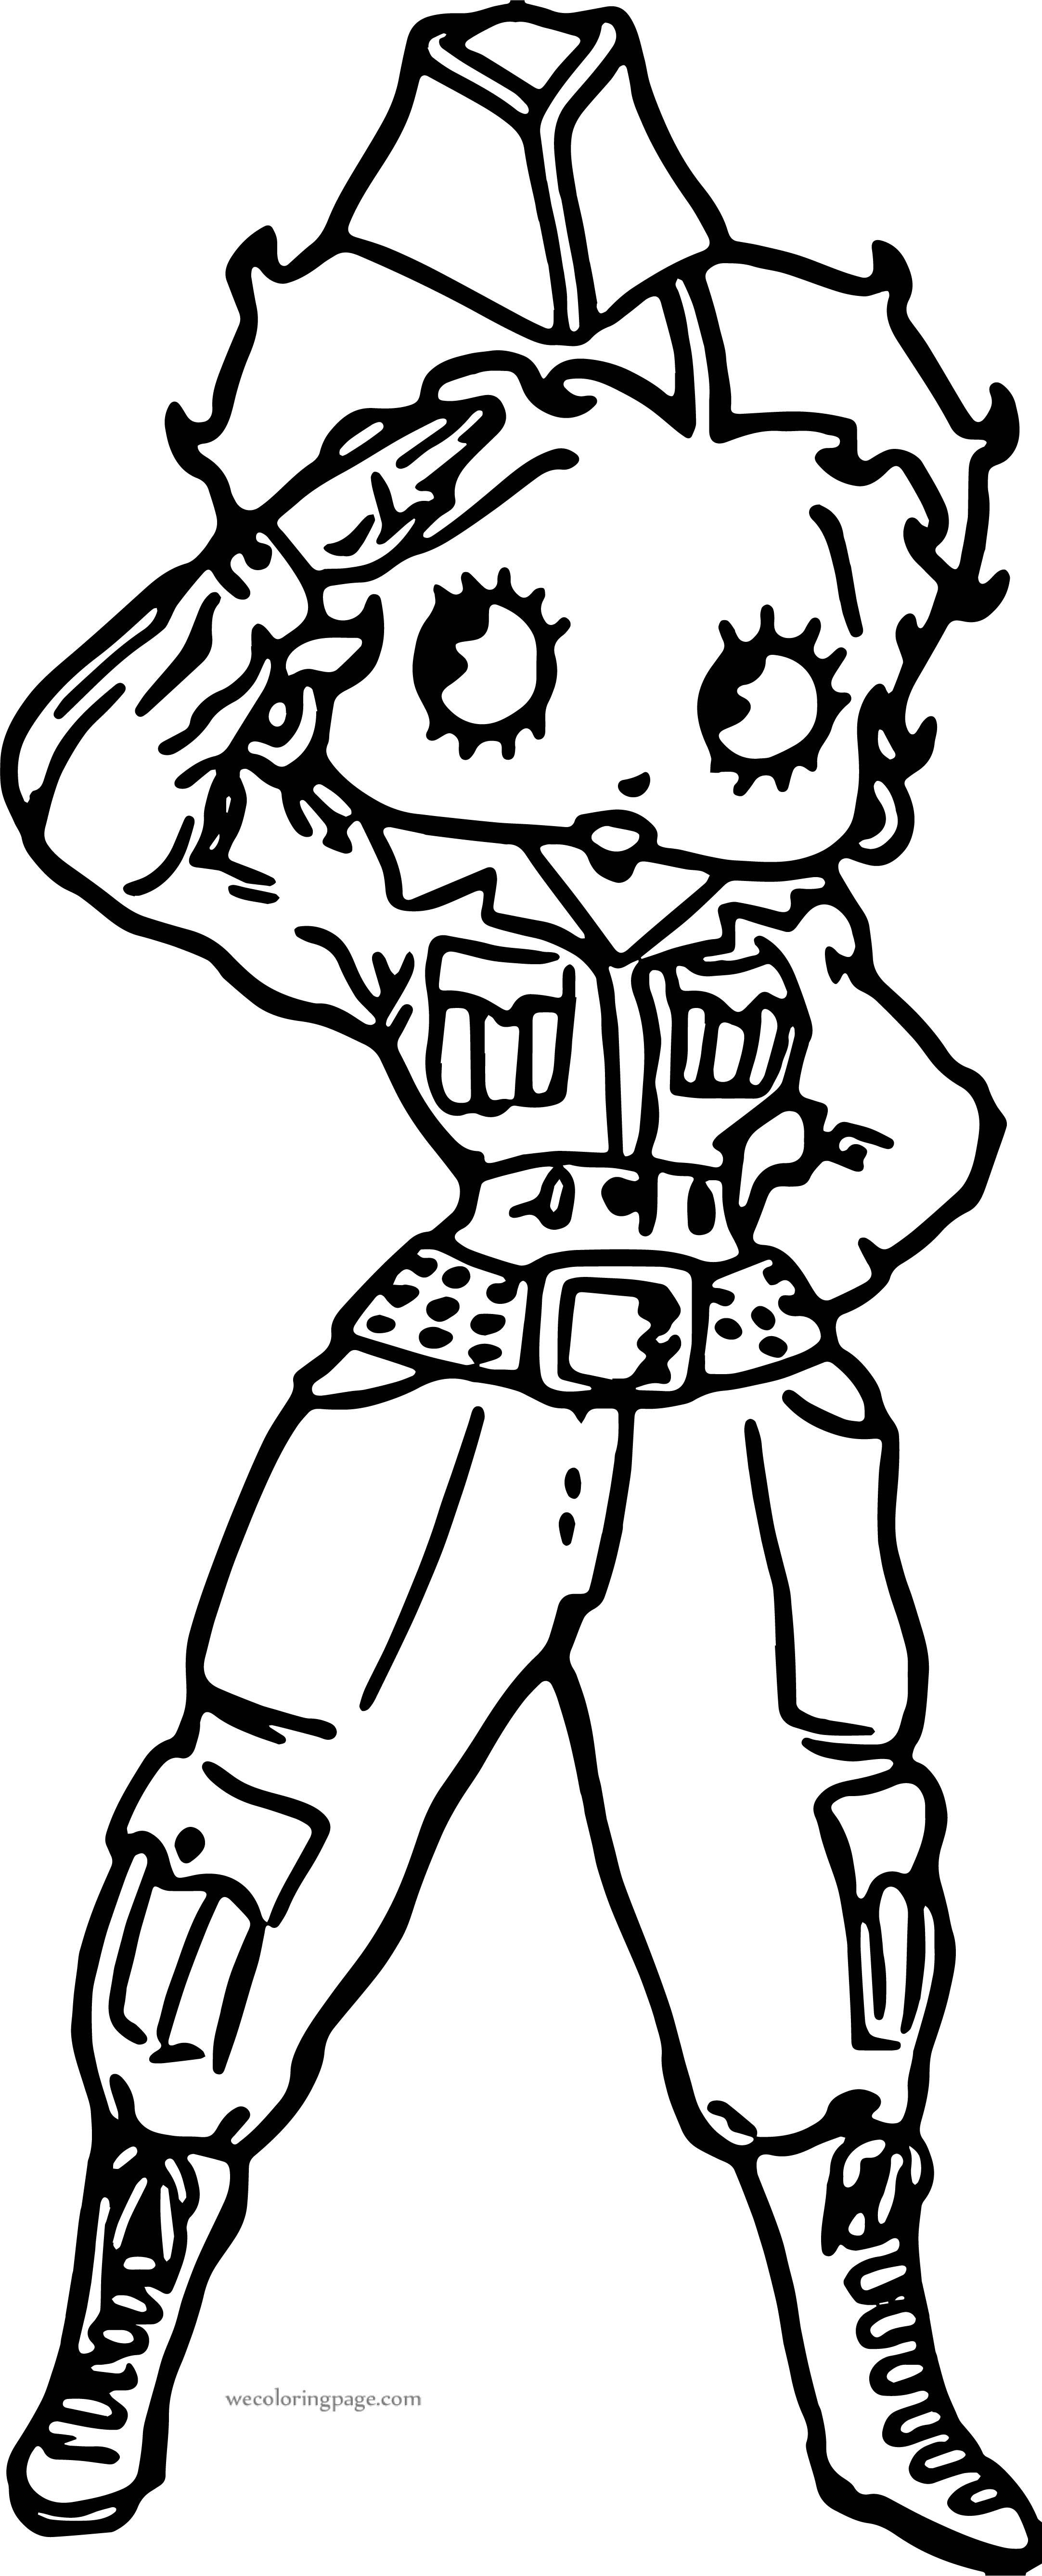 Betty Boop Soldier Hi Coloring Page Wecoloringpage Com